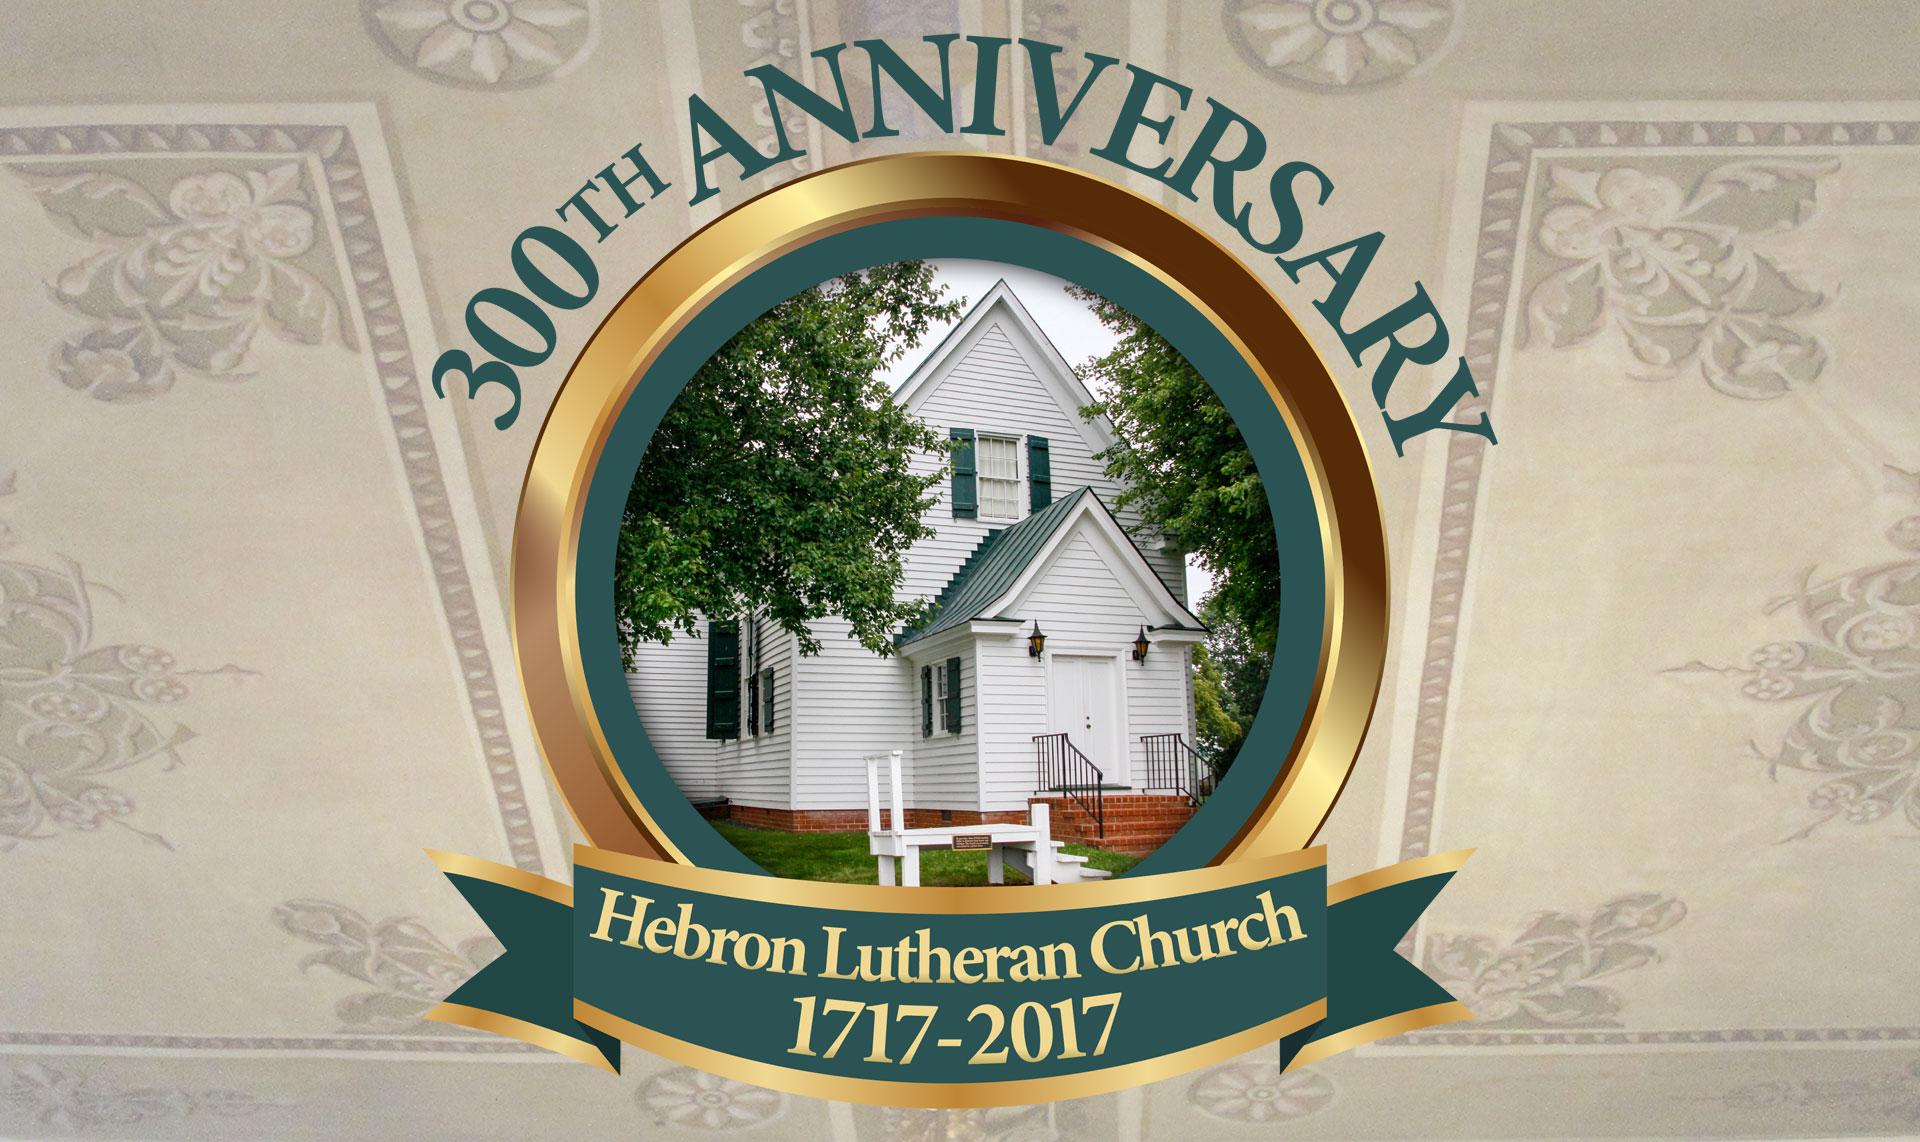 300th Anniversary of Hebron Lutheran Church in Madison, Virginia